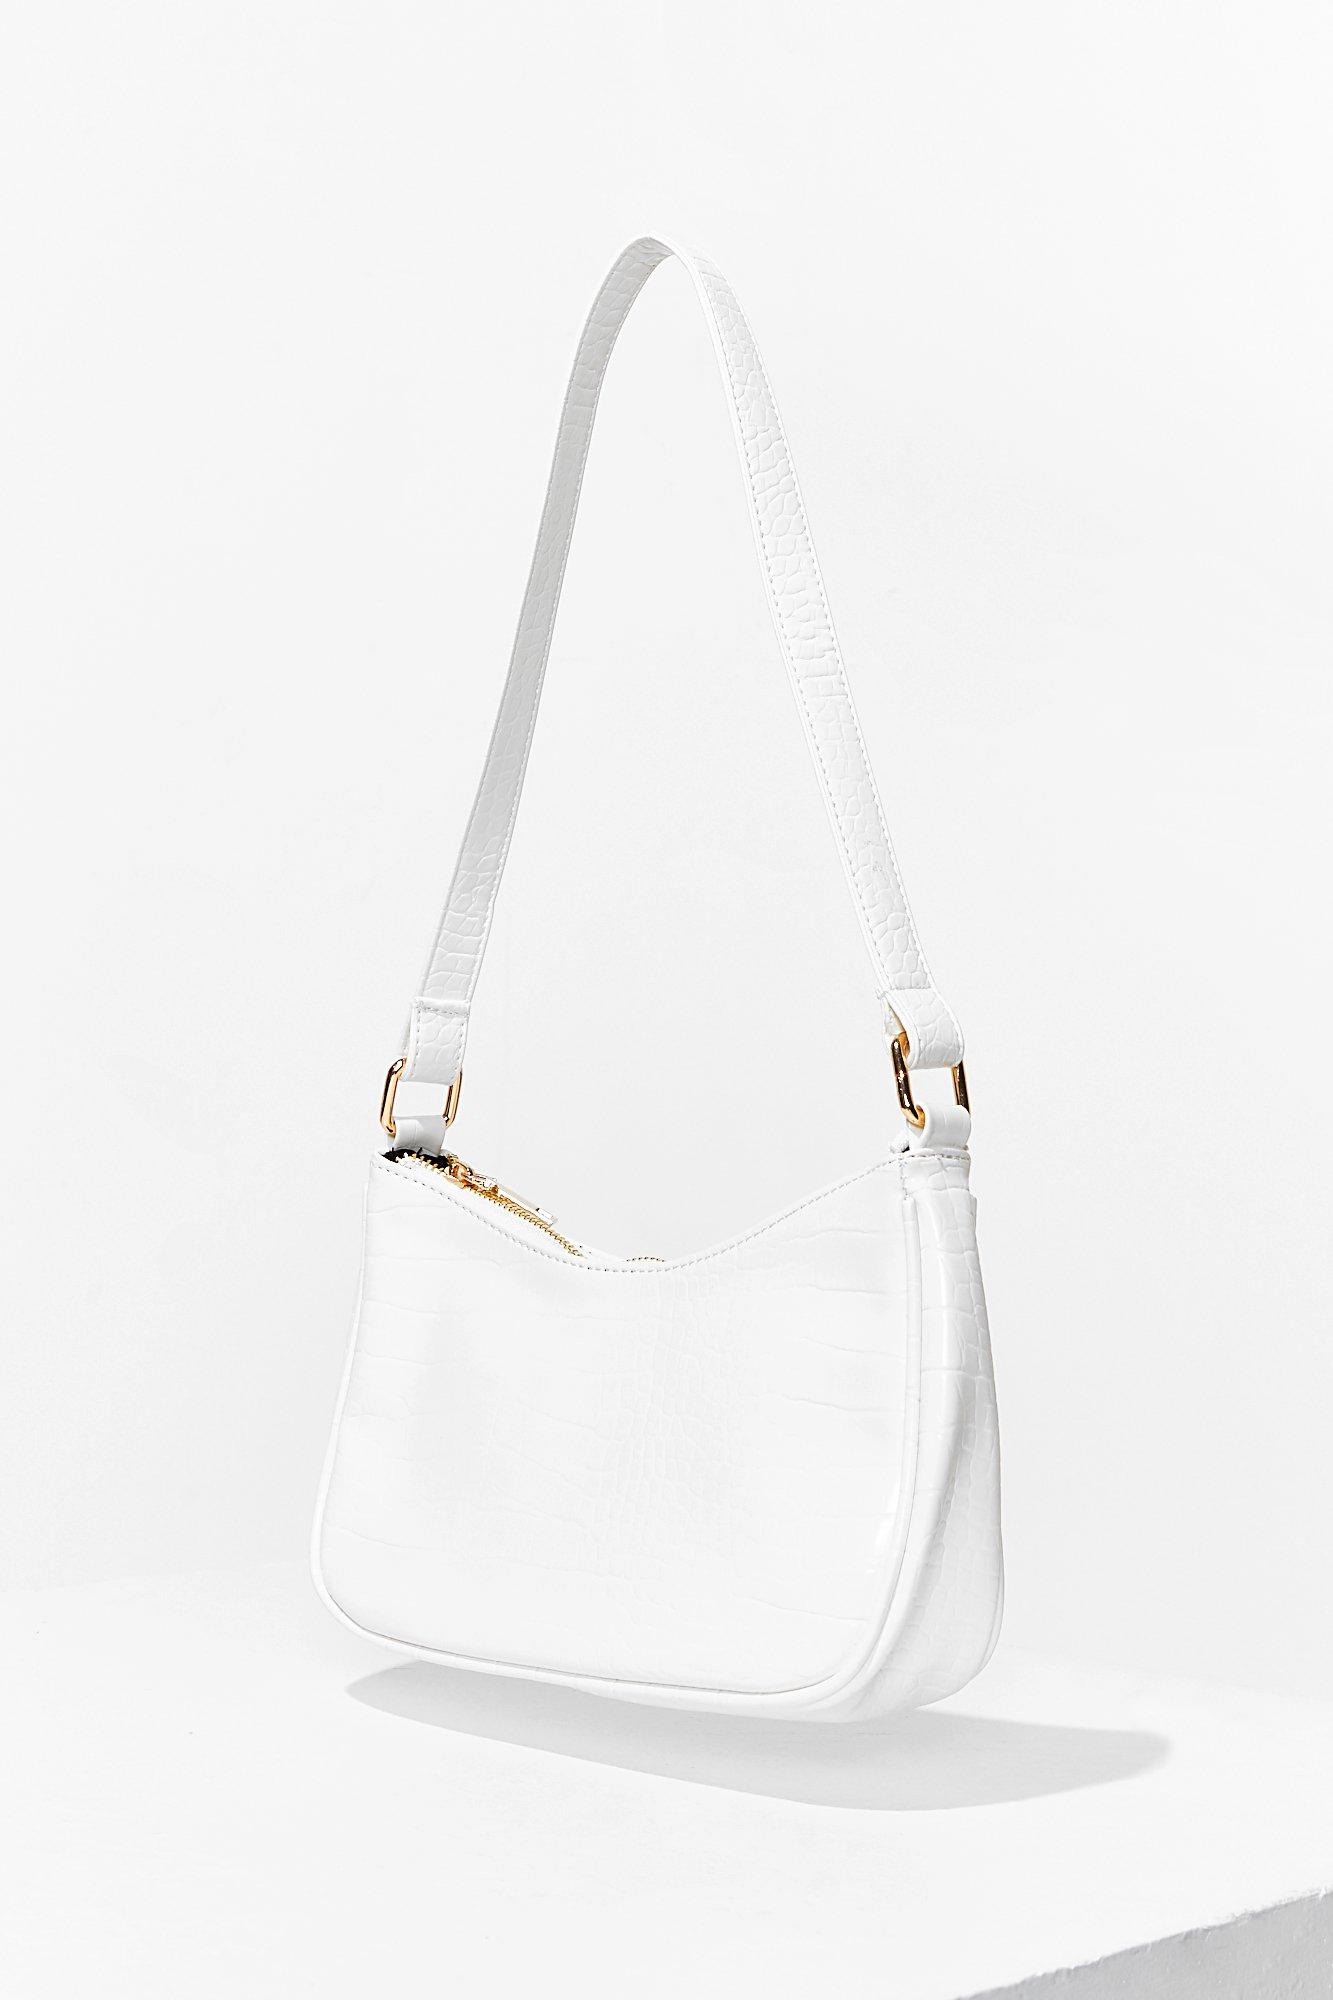 Vintage Handbags, Purses, Bags *New* Womens Want Croc Embossed Shoulder Bag - White - One Size $21.50 AT vintagedancer.com